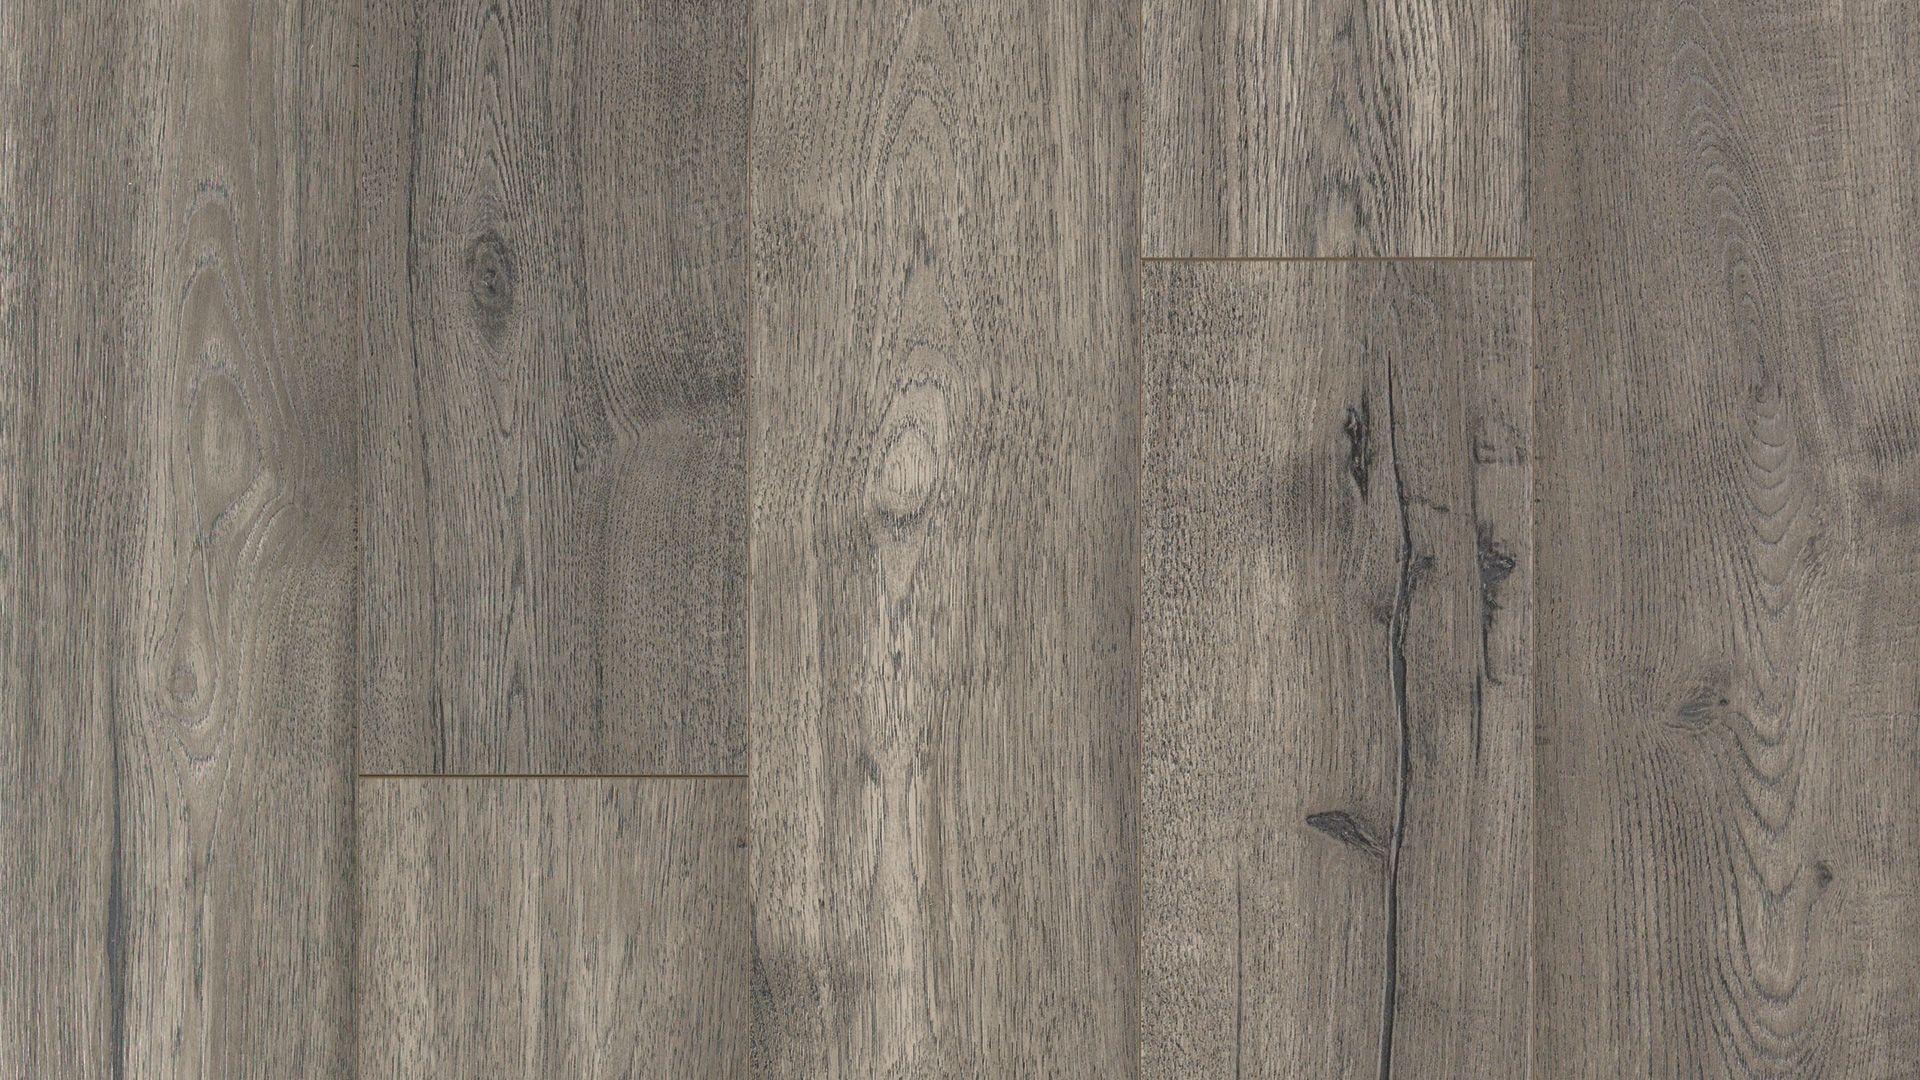 planks trends flooring tones in floors vinyl neutral and grey laminate pin luxury plank wide